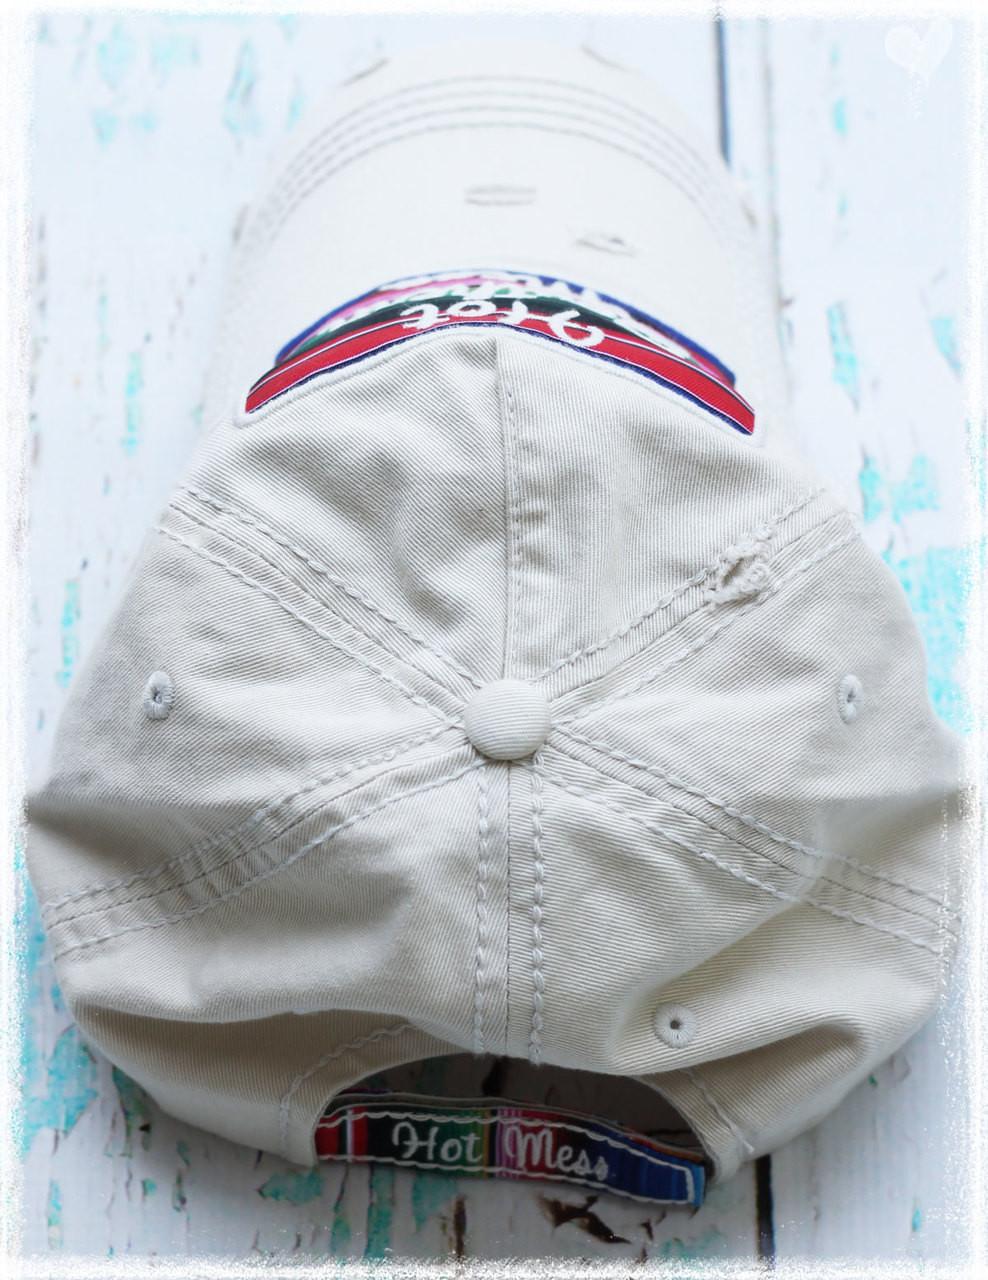 Hot Southern Mess baseball hat by Dang Chicks